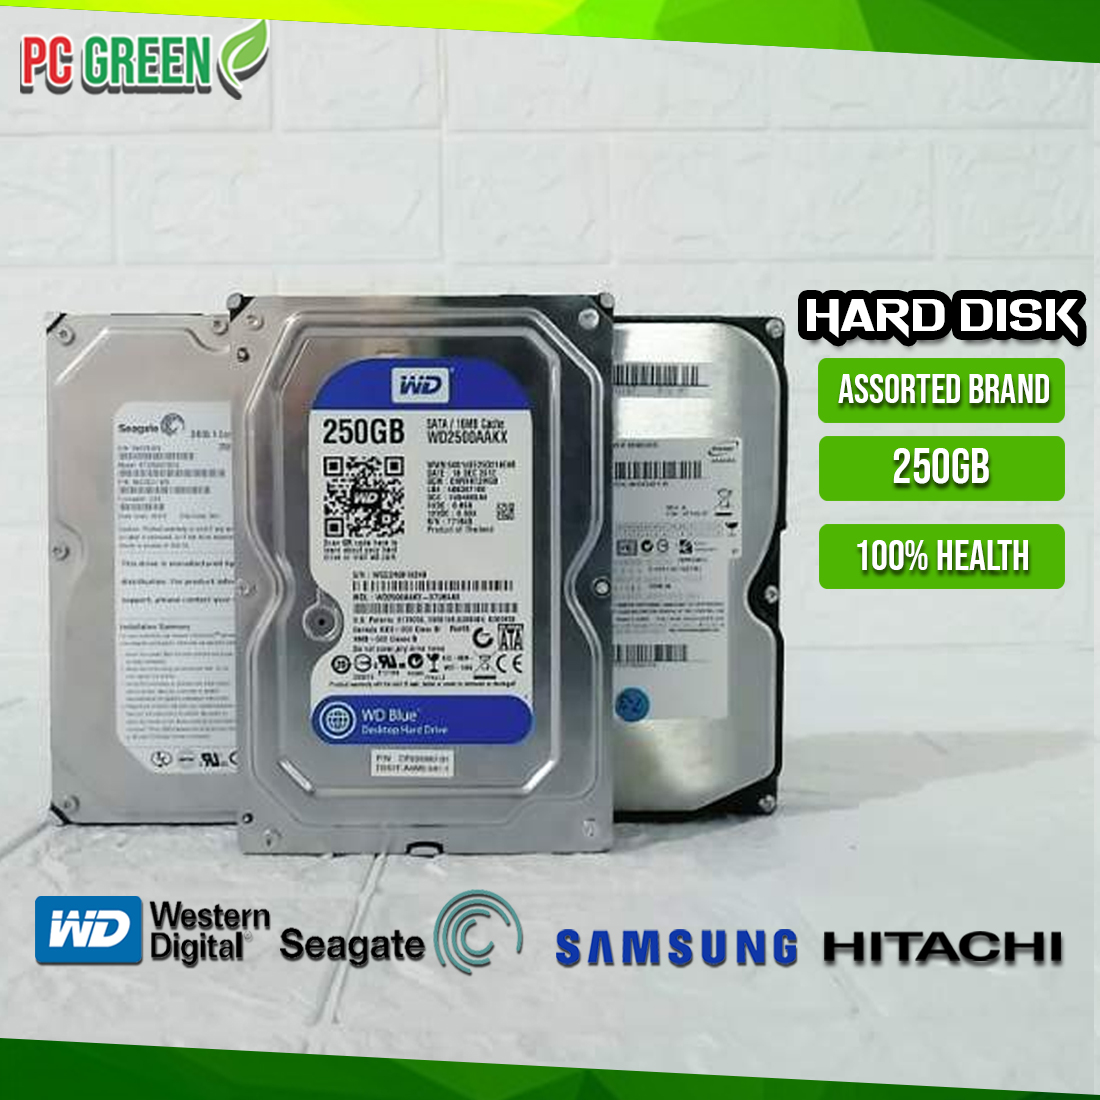 1TB 320GB 2TB Tested Hard Drives 500GB Seagate Barracuda 160GB